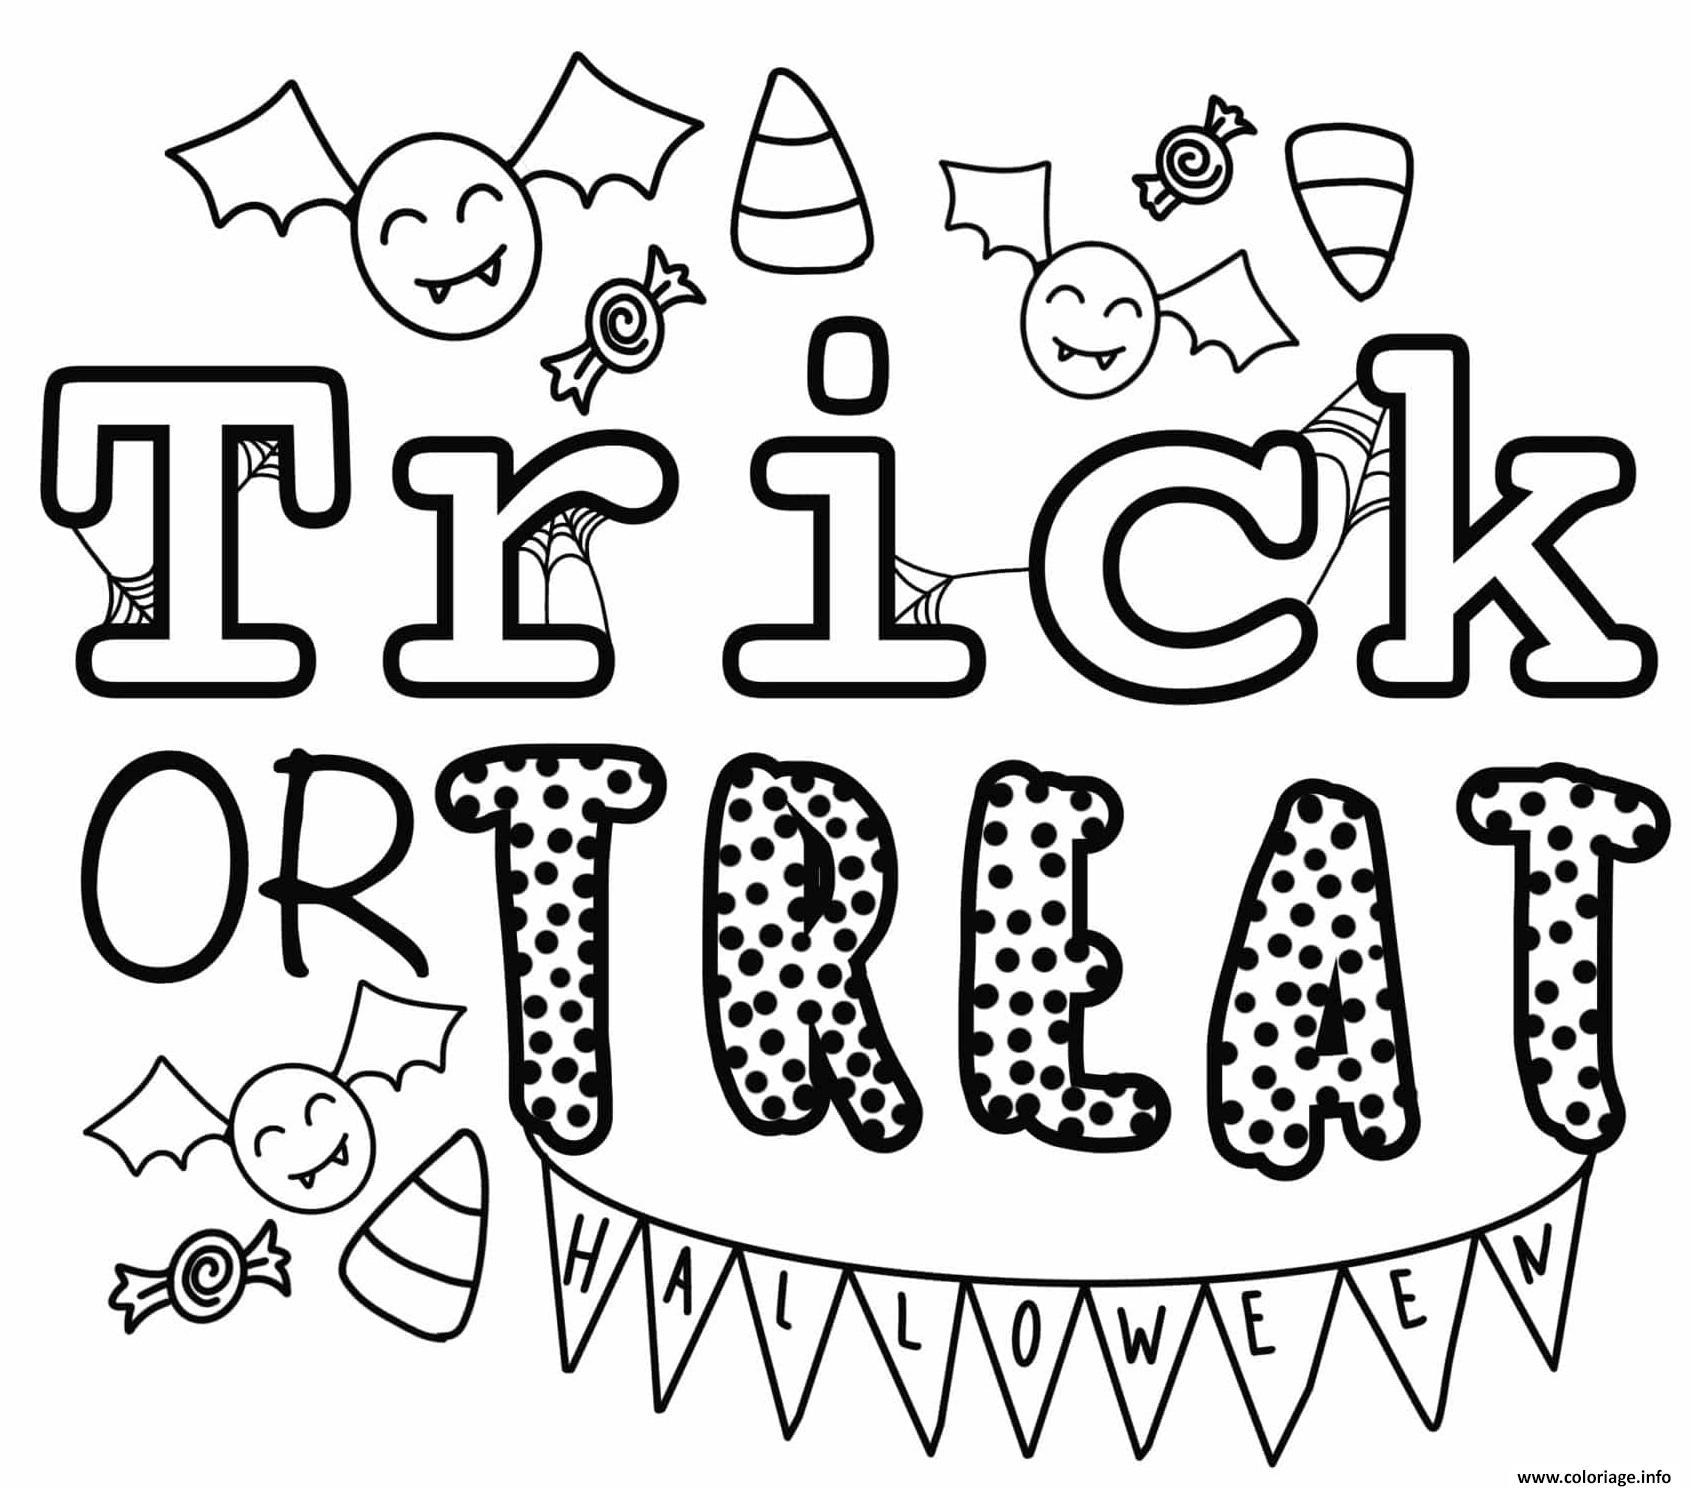 Dessin trick or treat halloween by Heather Hinson Coloriage Gratuit à Imprimer